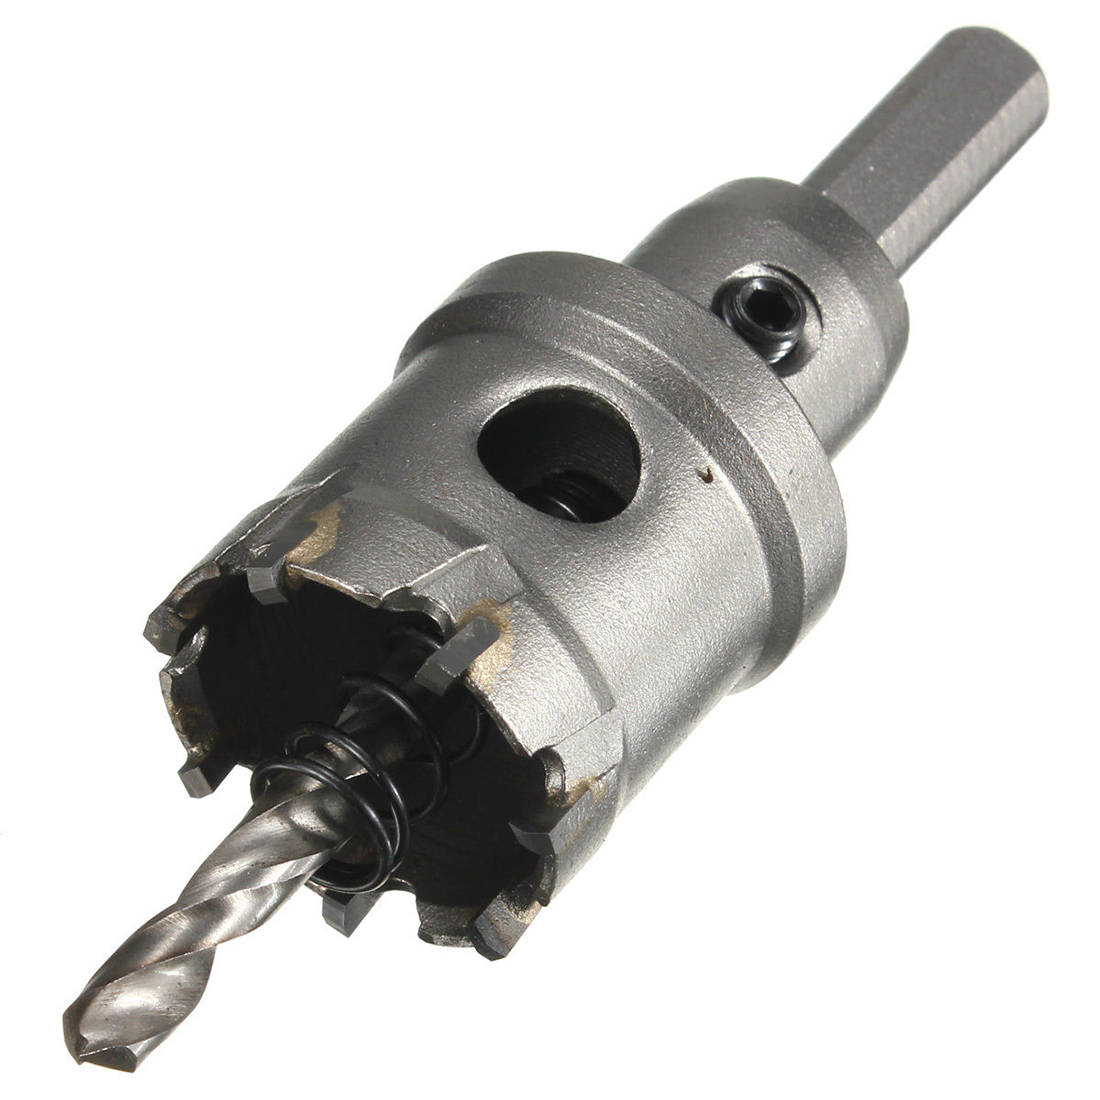 цена на LIXF Carbide Tip Metal Cutter Stainless Steel HSS Drill Bit Hole Saw Holesaw Size:32mm